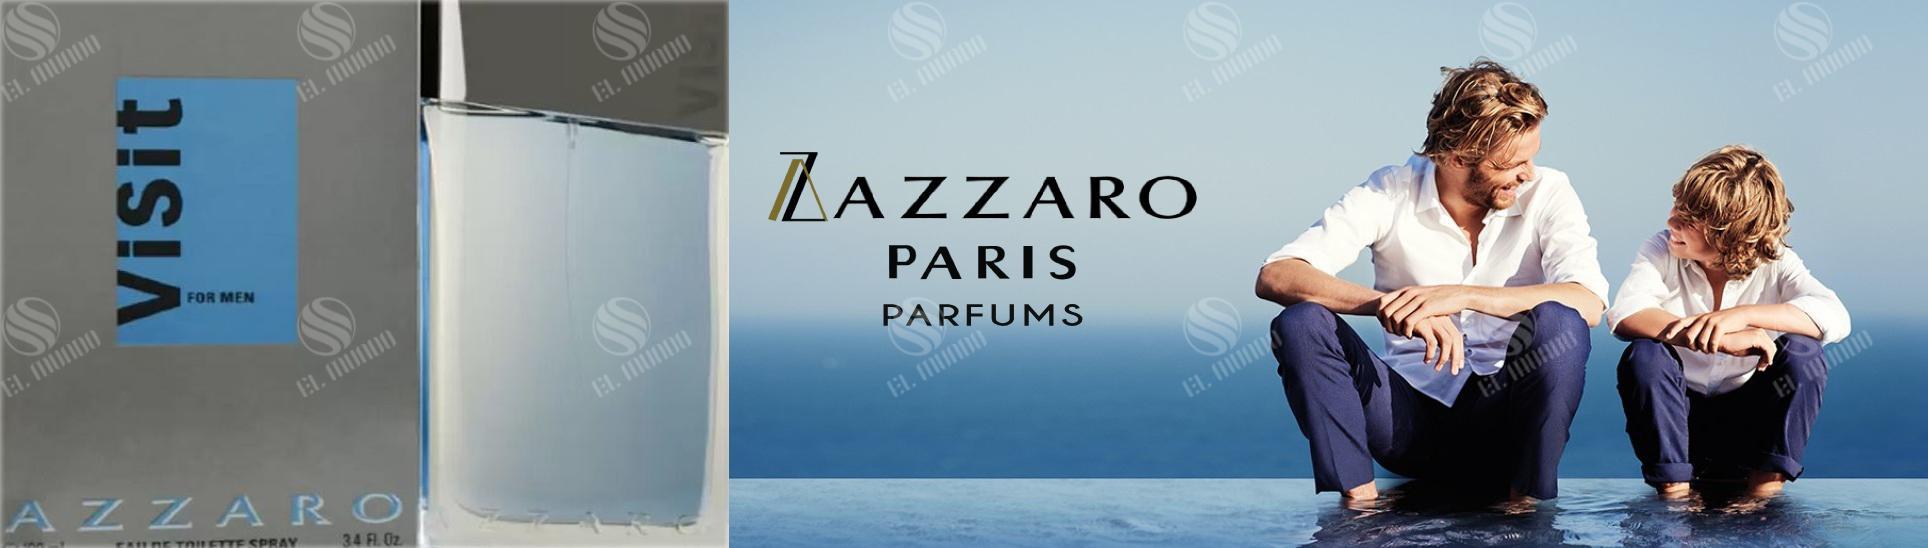 Azzaro Perfume Banner - عطر ادکلن مردانه آزارو ویزیت ادوتویلت ۱۰۰ میل Visit For Men